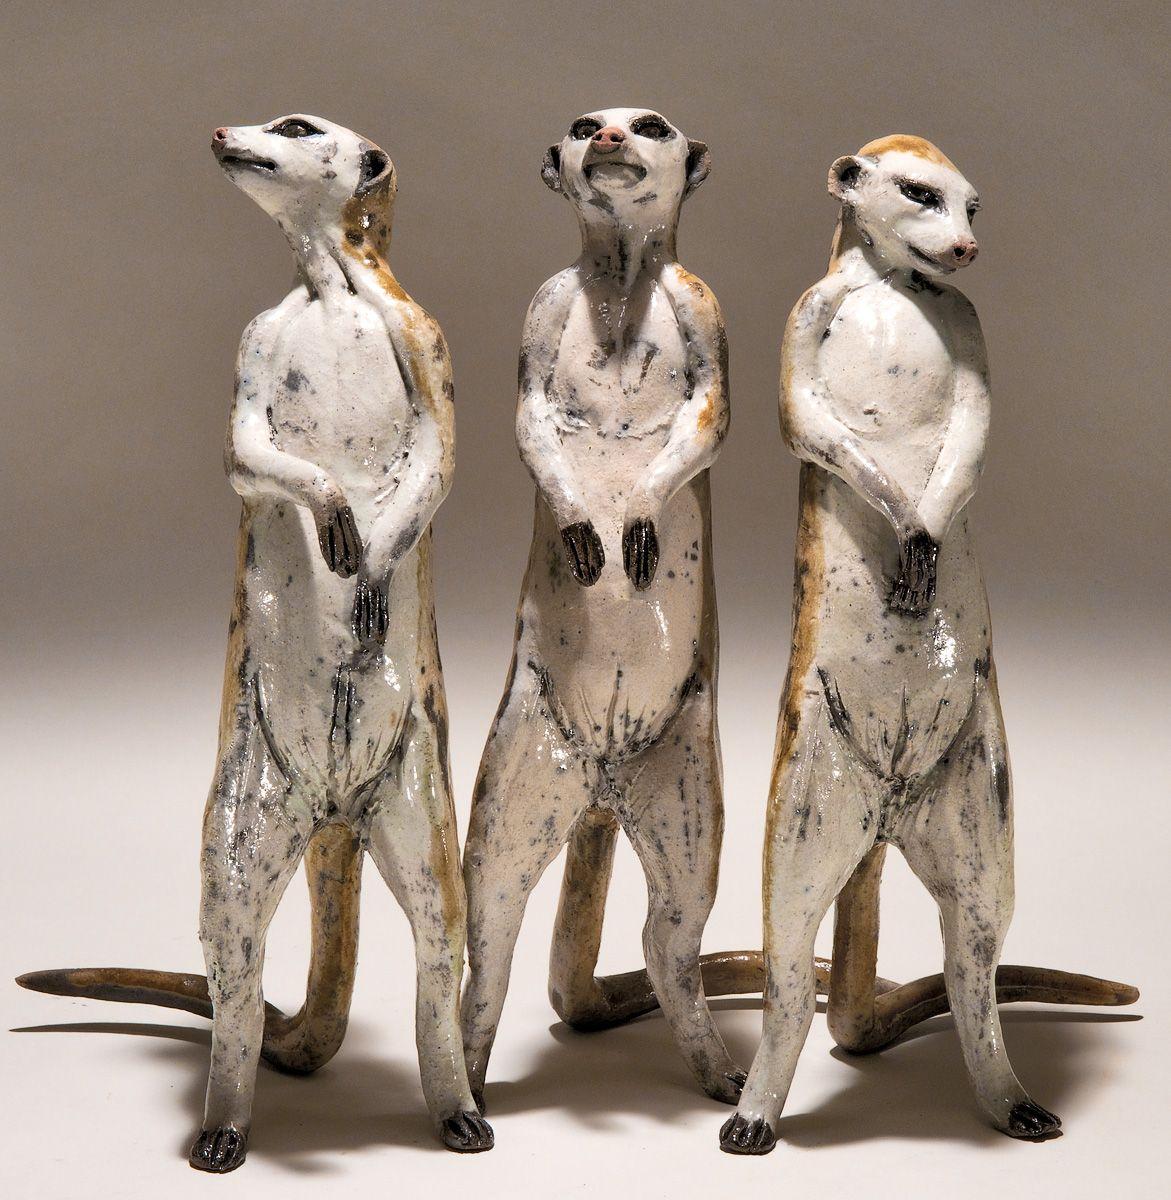 meerkat sculptures by nick mackman  ceramic animals  pinterest  - ceramic art